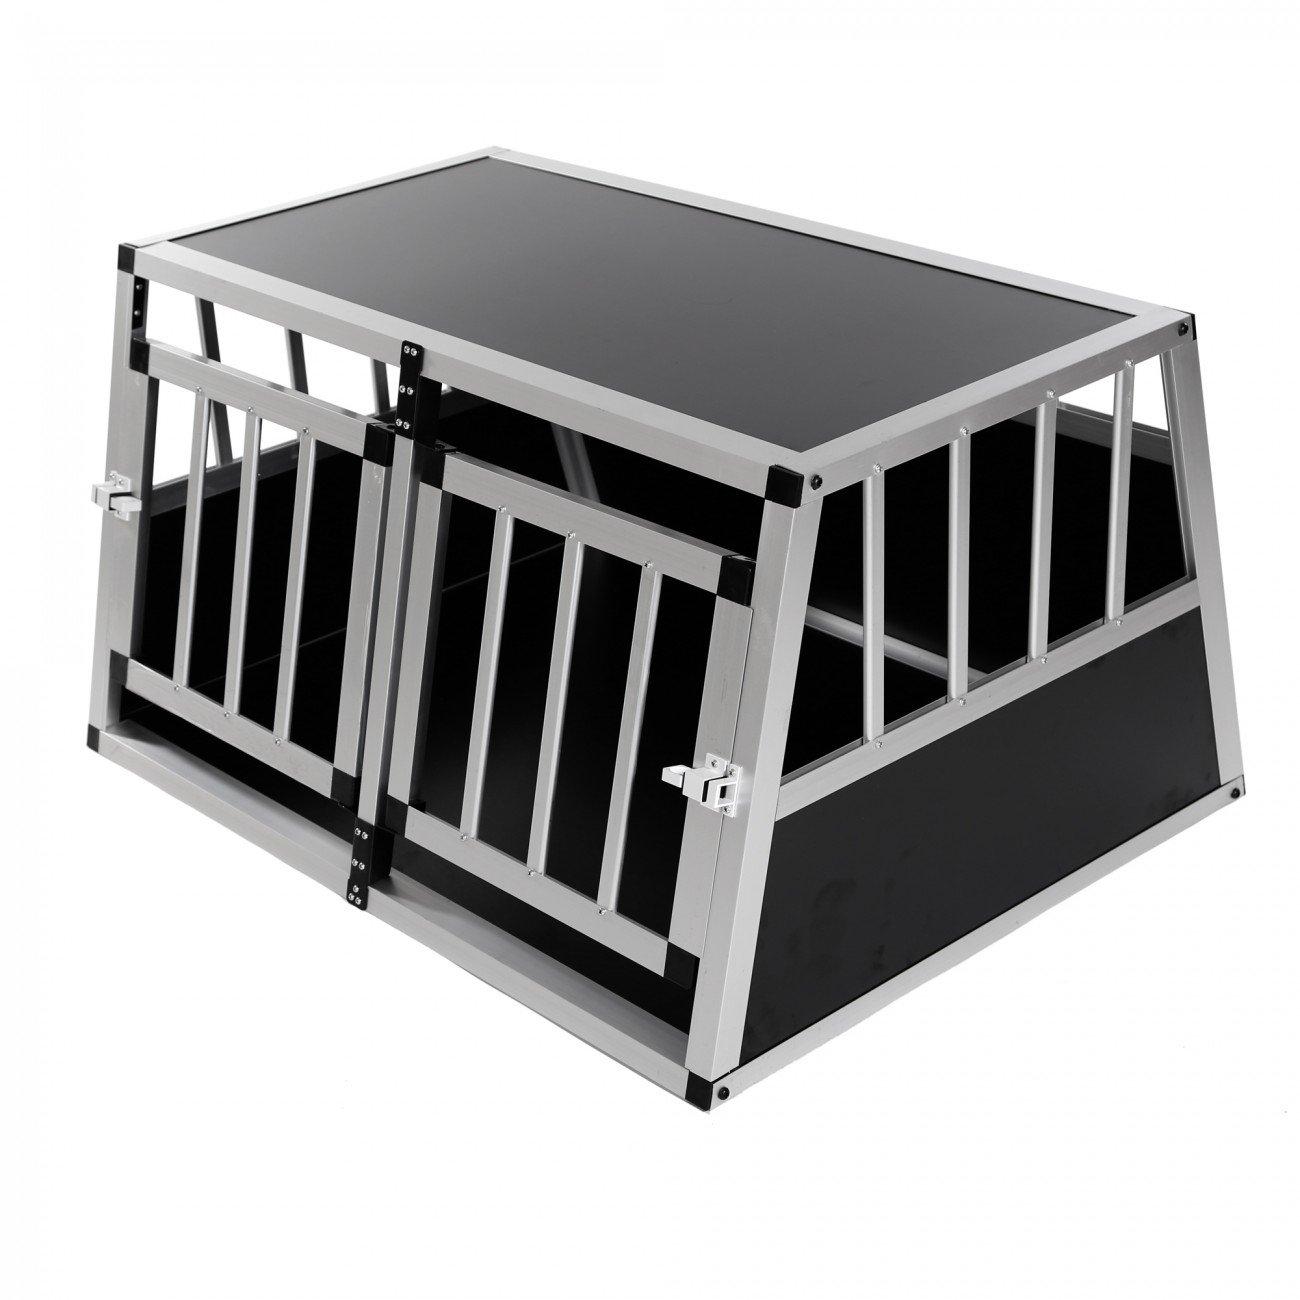 ZOOMUNDO Transportí n para Perros/Jaula de Transporte de Aluminio - 2 Puertas Premium